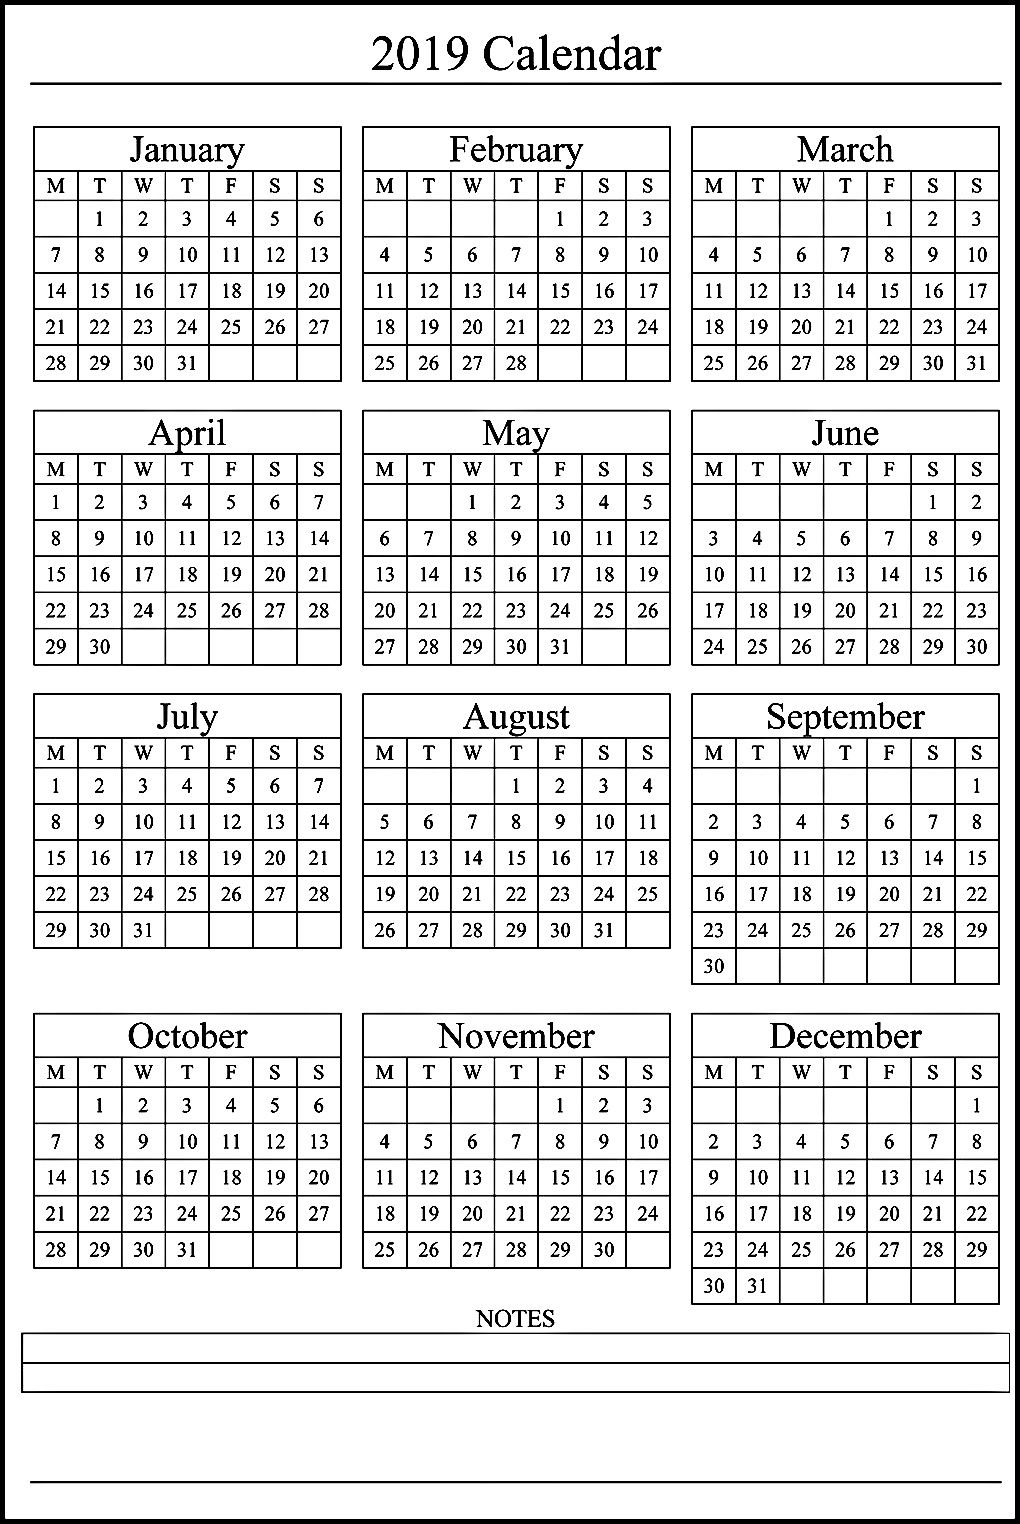 12 Month Calendar On One Page #2019Calendar #holidayscalendar within Blank 12 Month Calendar Page